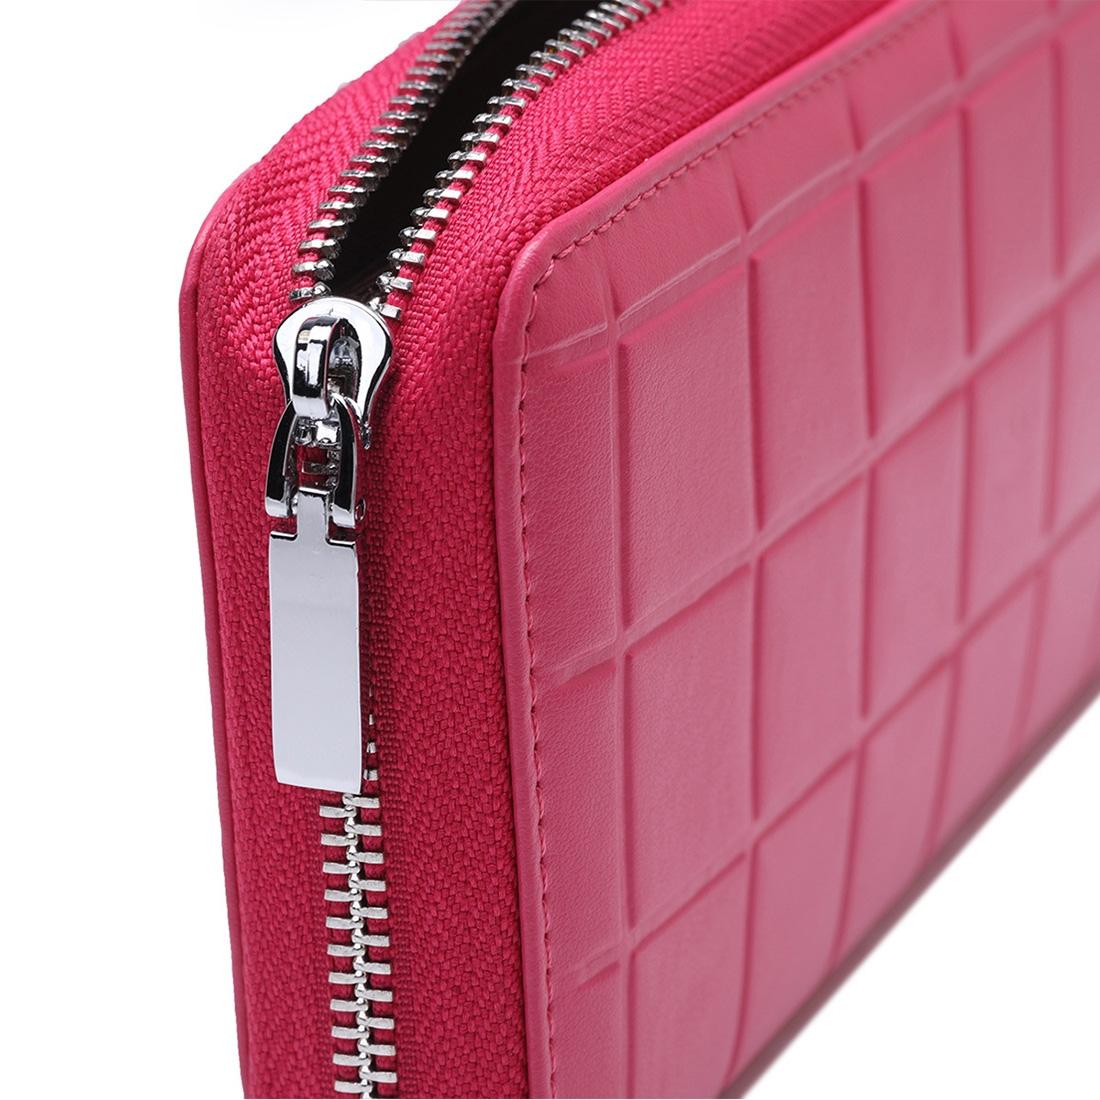 903 Antimagnetic RFID Female Large Capacity Casual Square Organ Card Bag/ wallet/ Clutch Bag (Magenta)